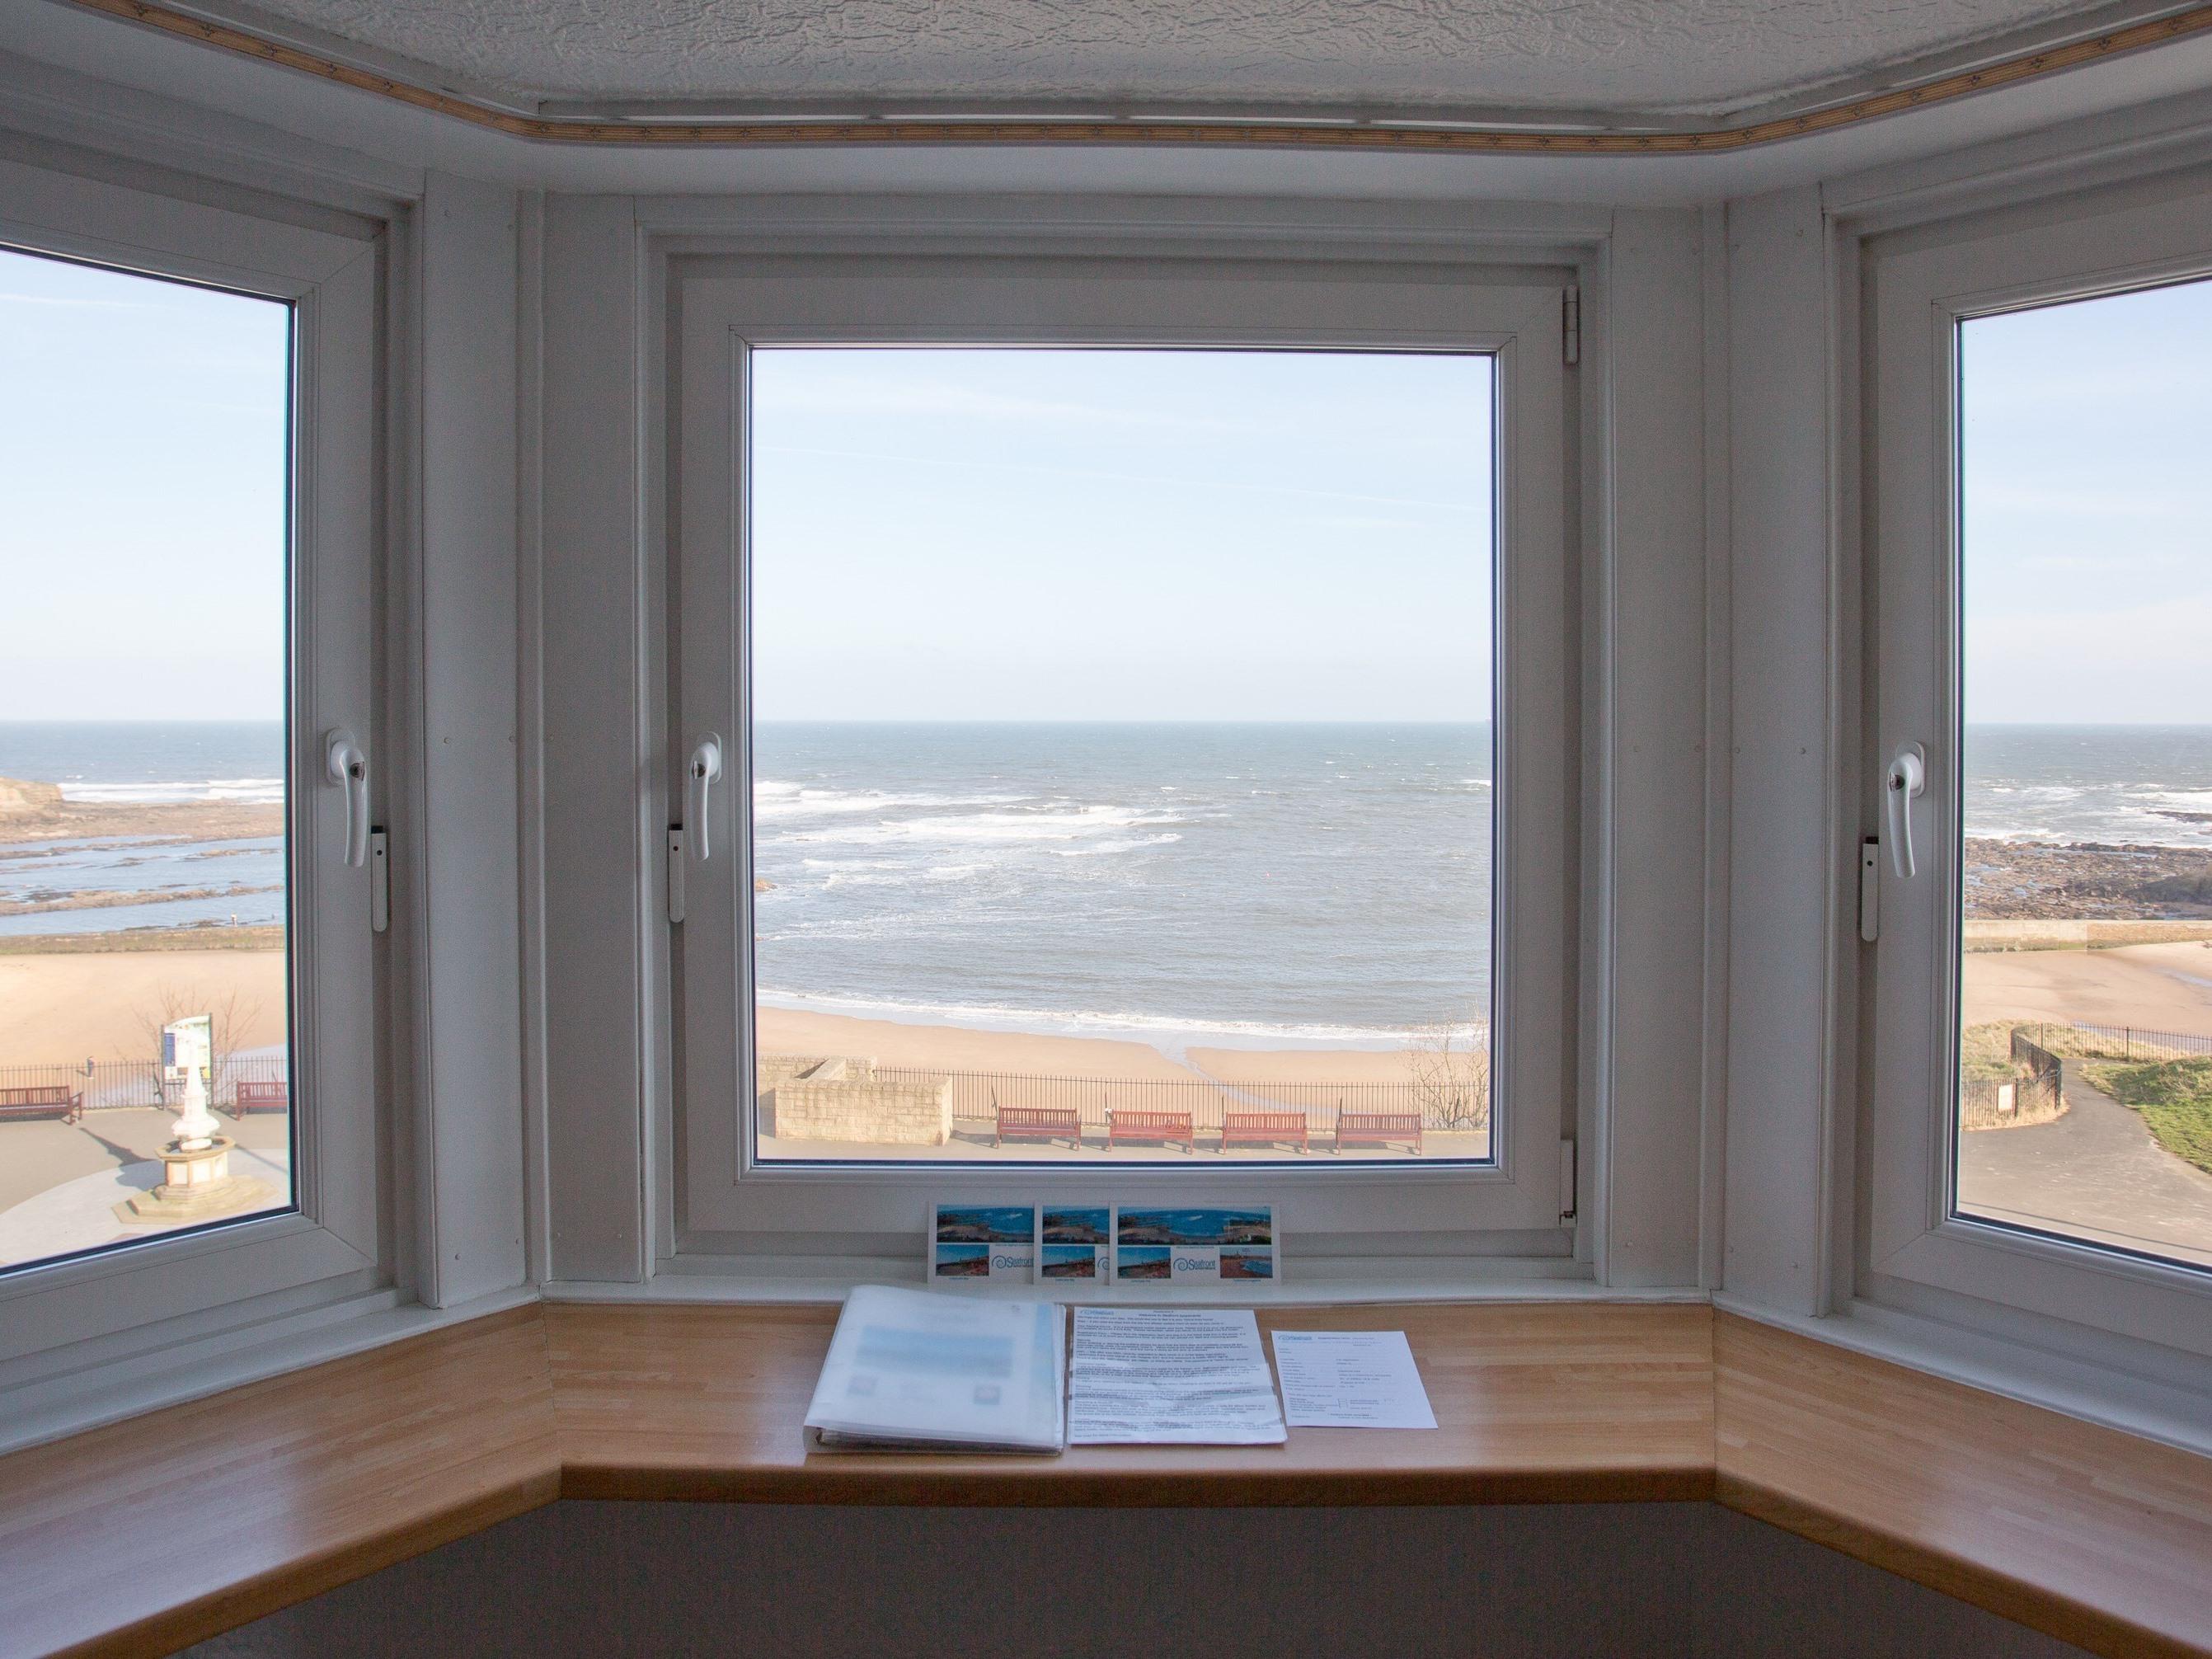 Apartment 5 Panoramic sea view